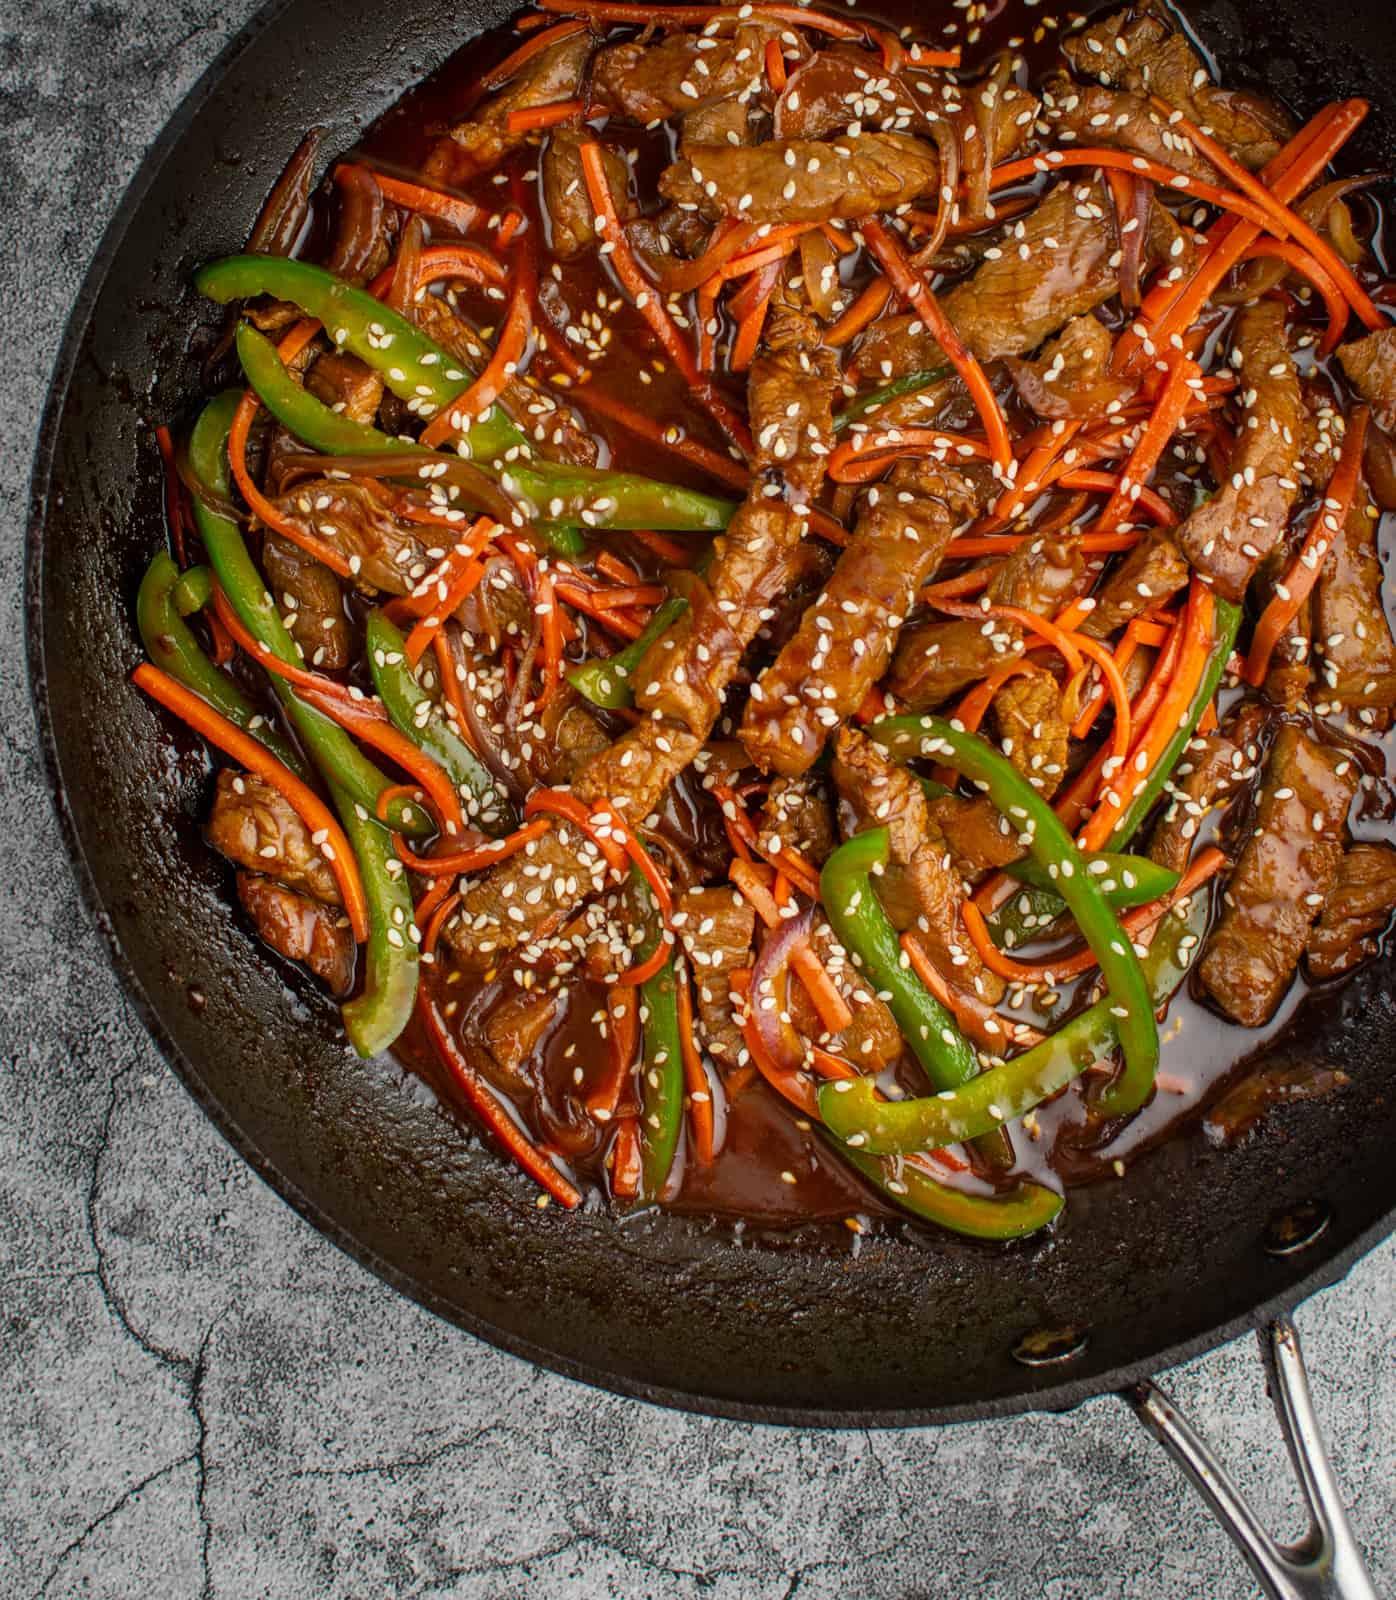 Korean beef stir-fry in a scanpan frying pan